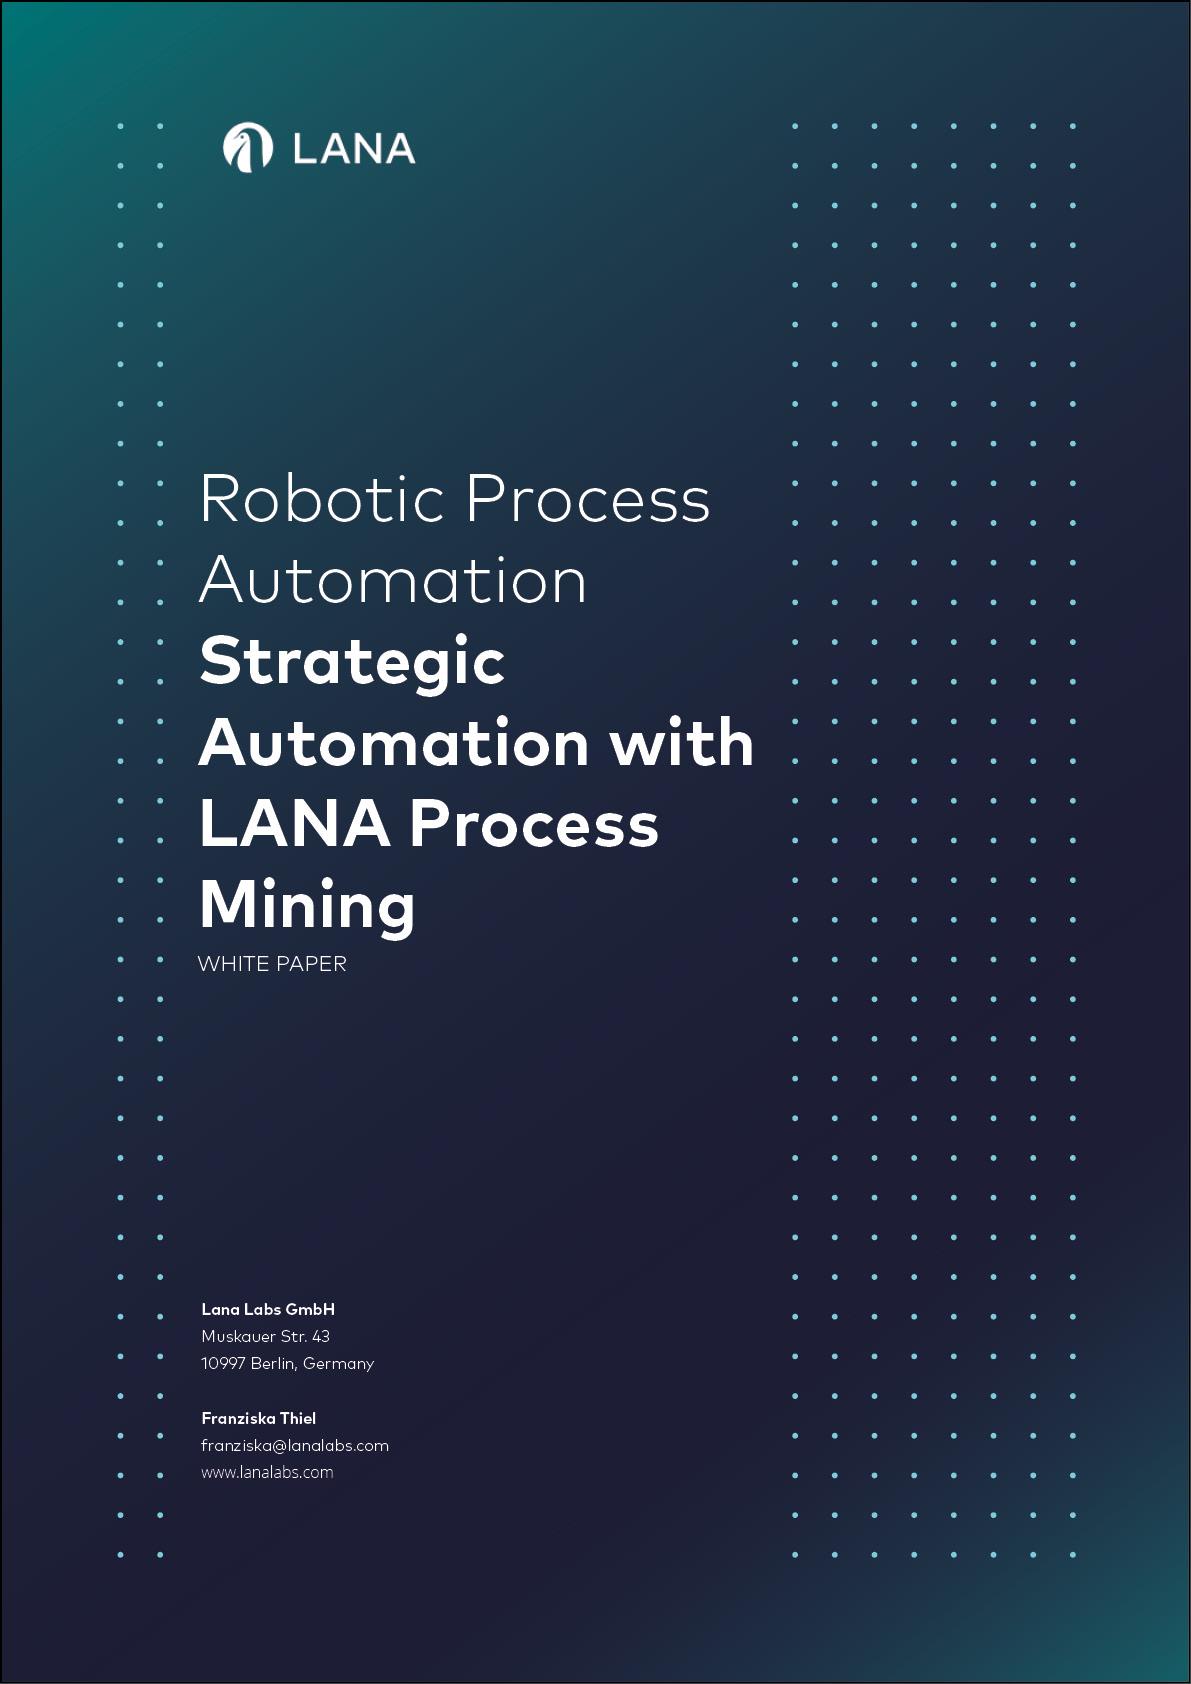 whitepaper-rpa-lana-process-ming-cover